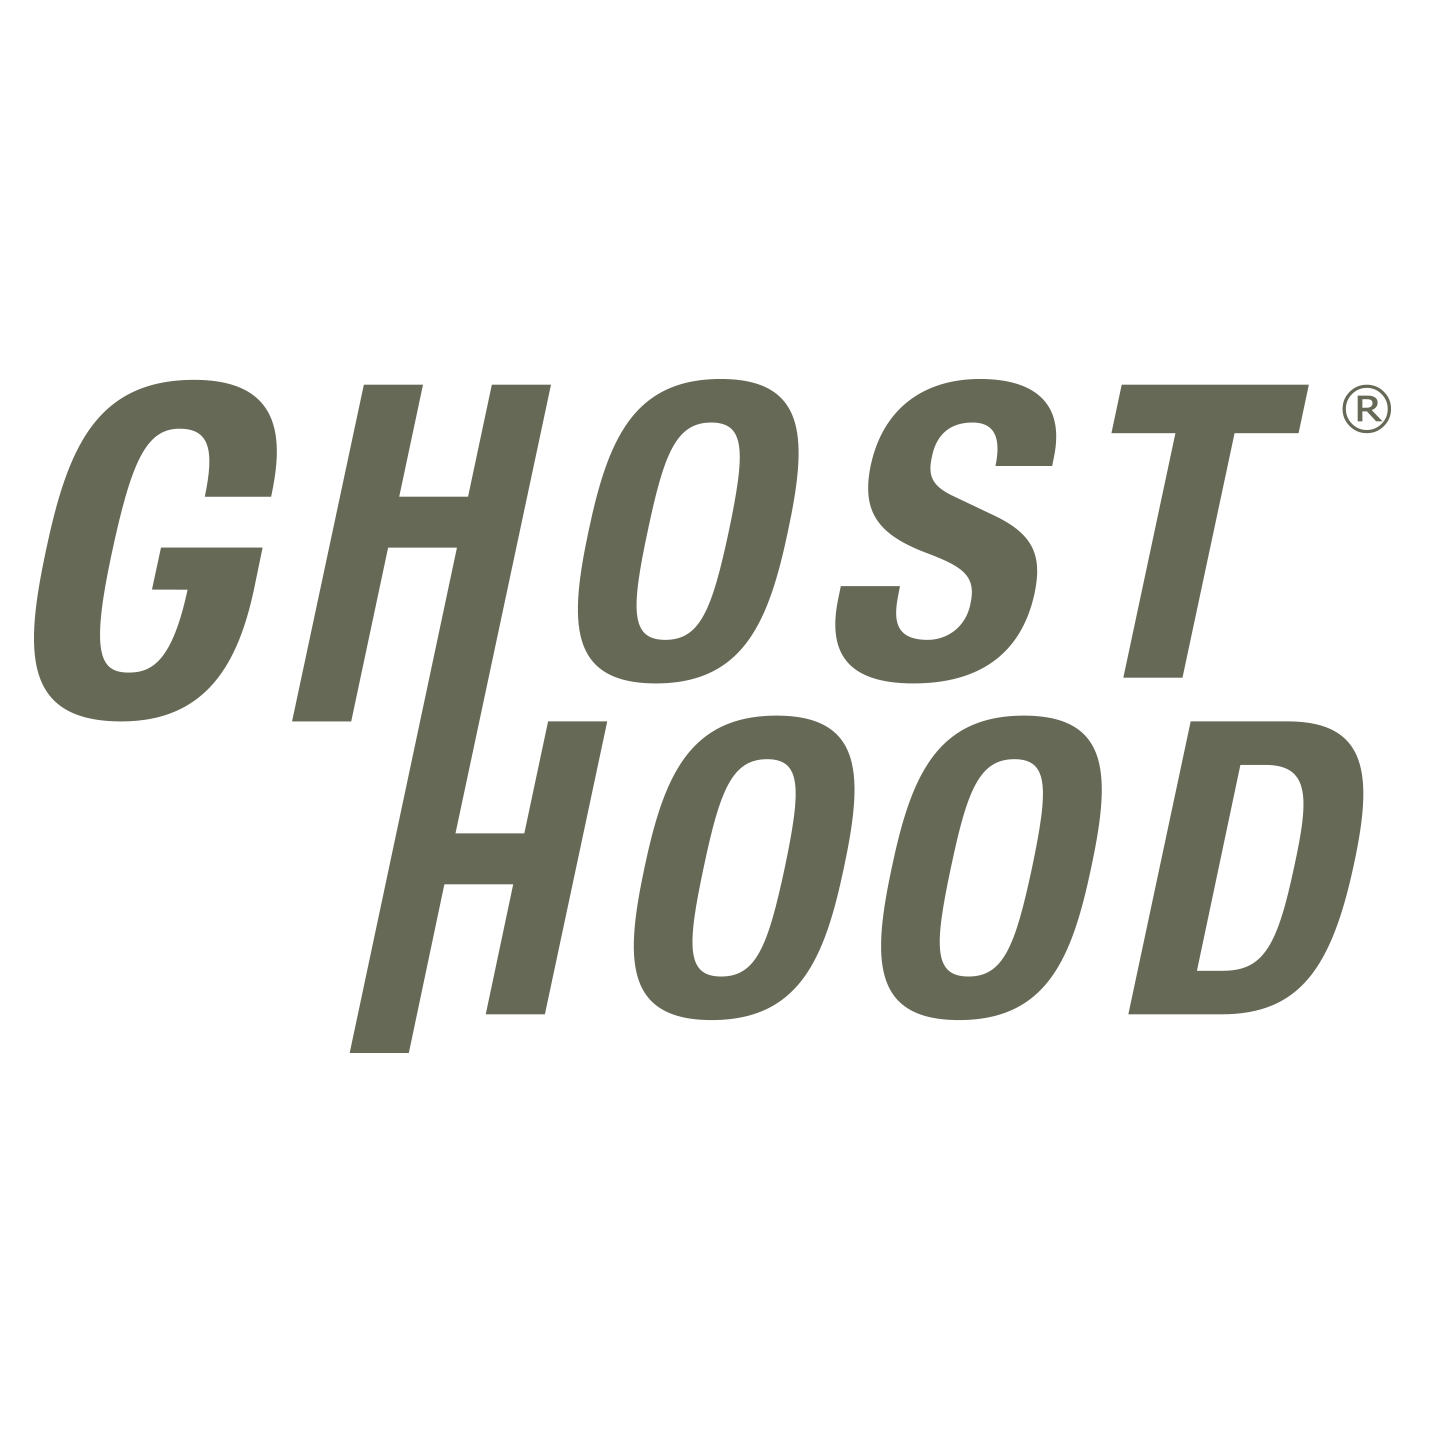 Ghosthood